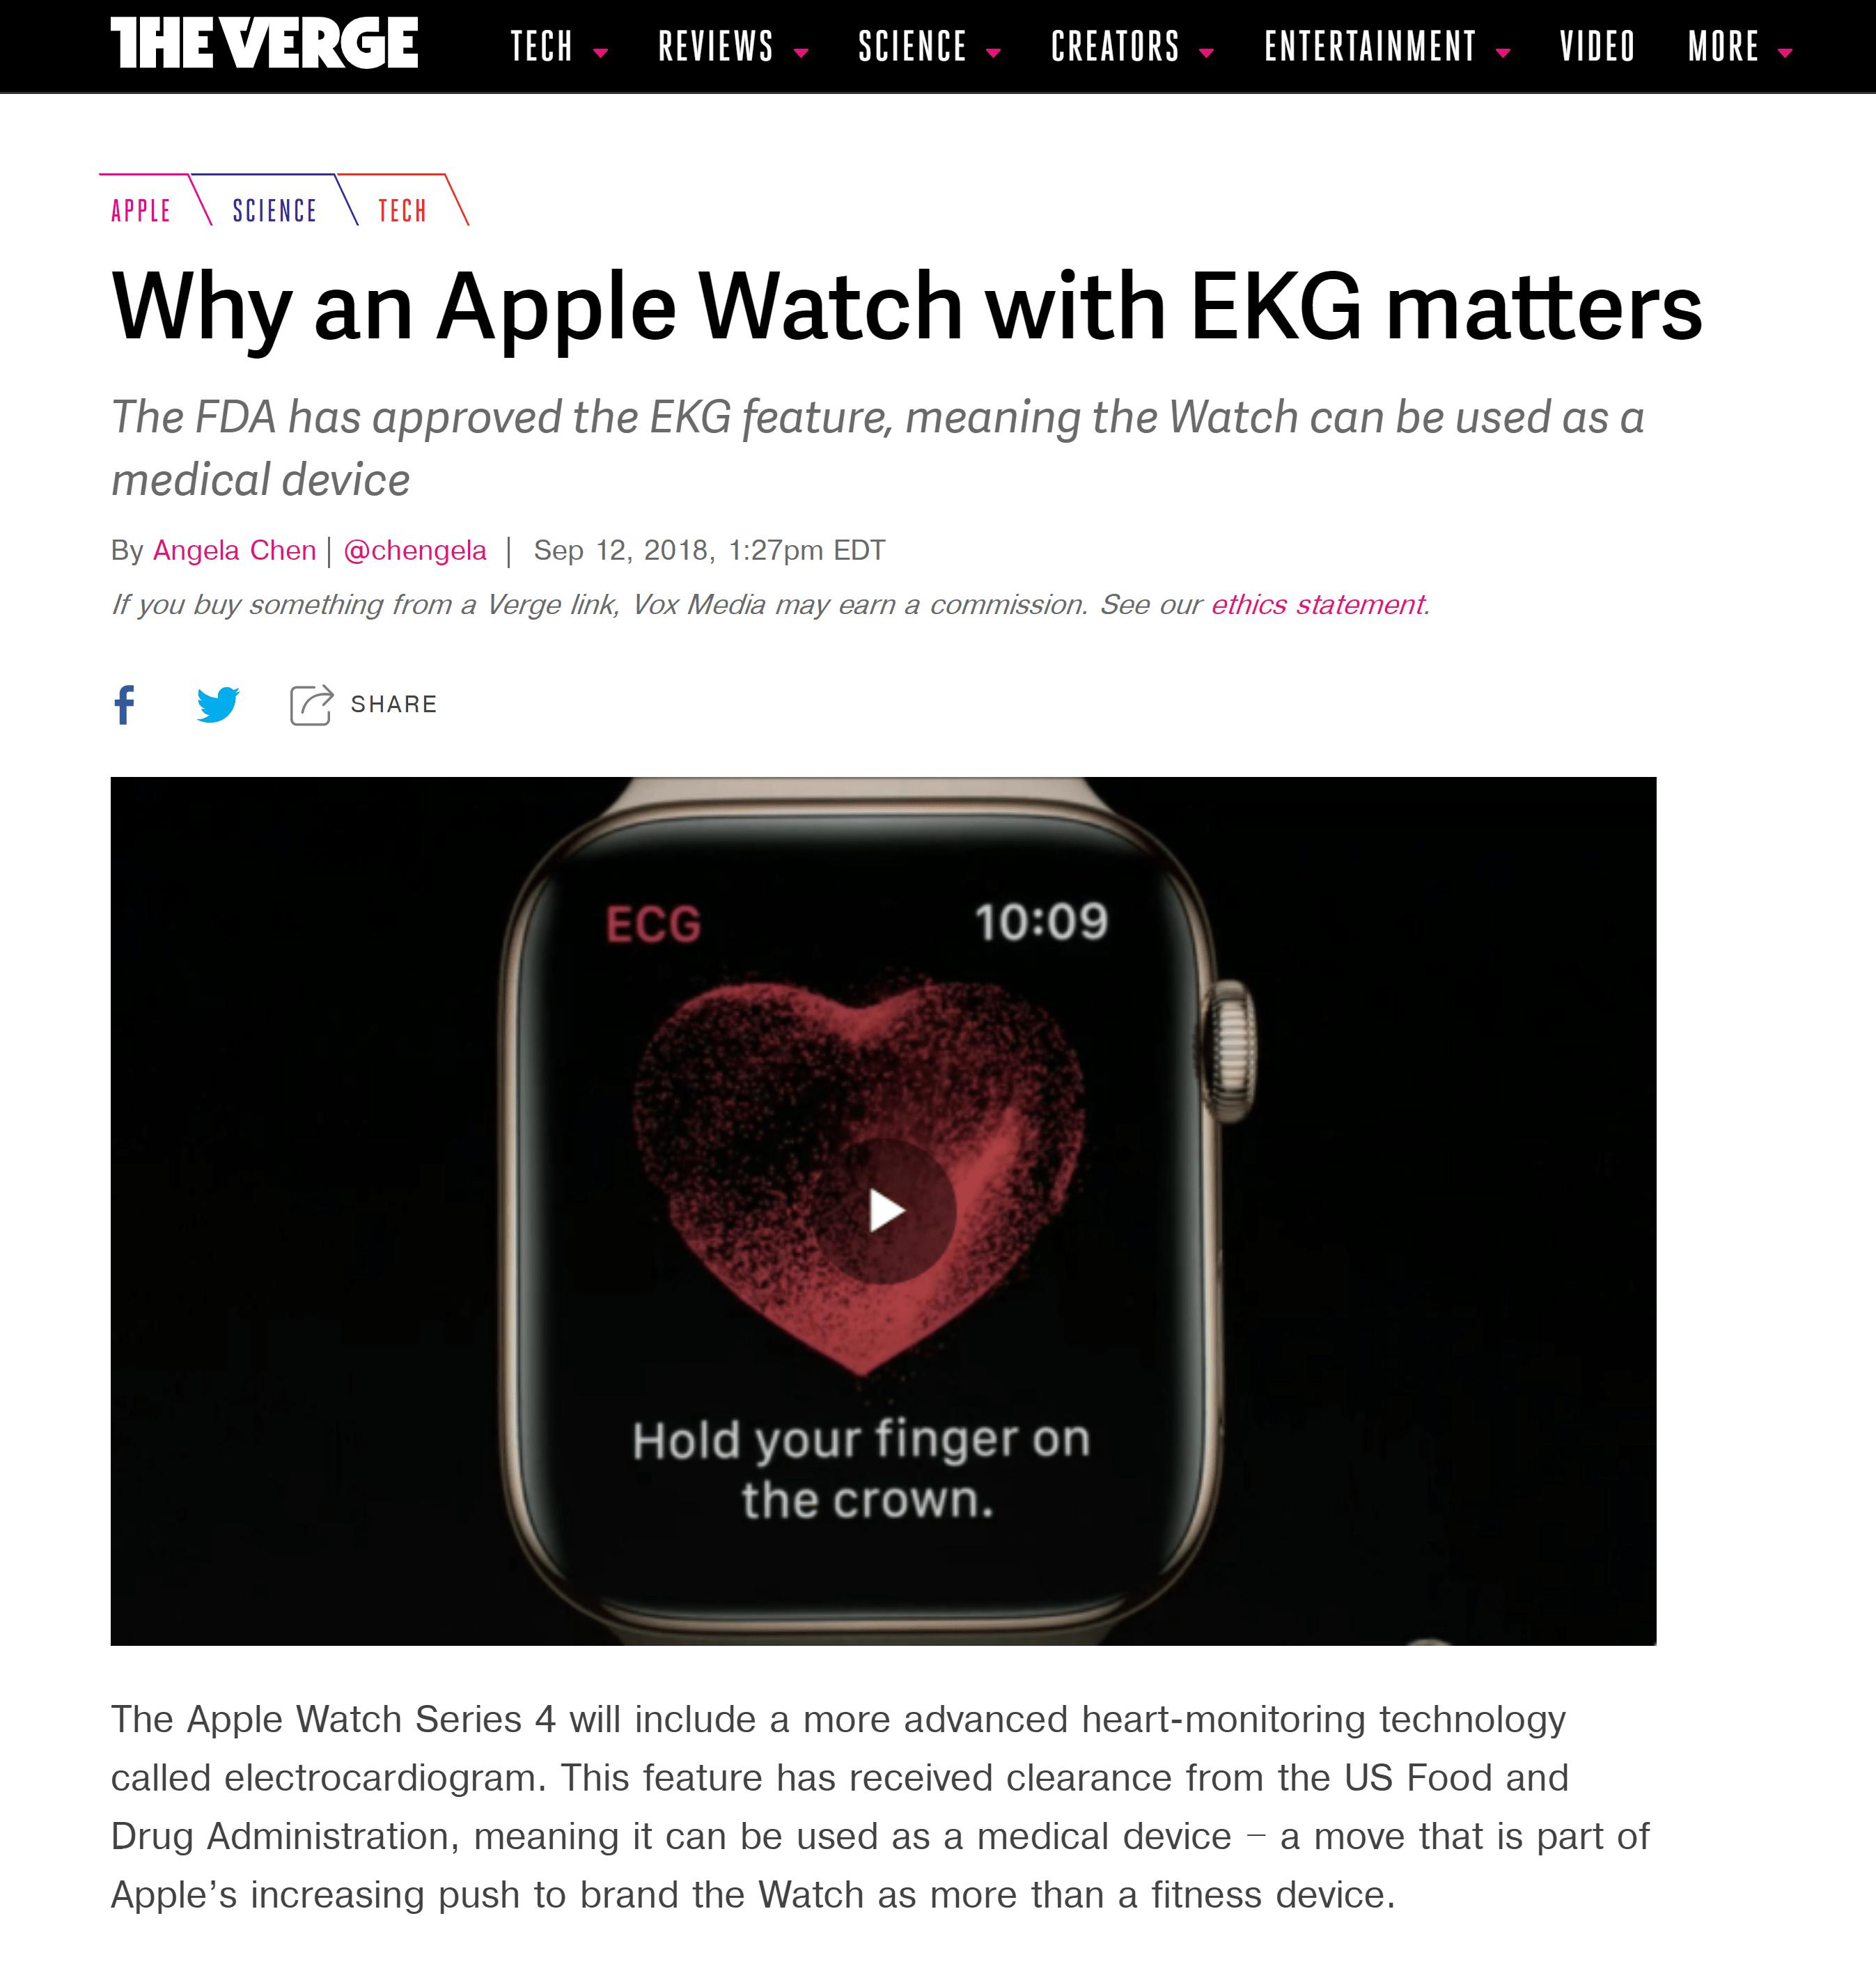 apple-watch-series-4-ekg-electrocardi...